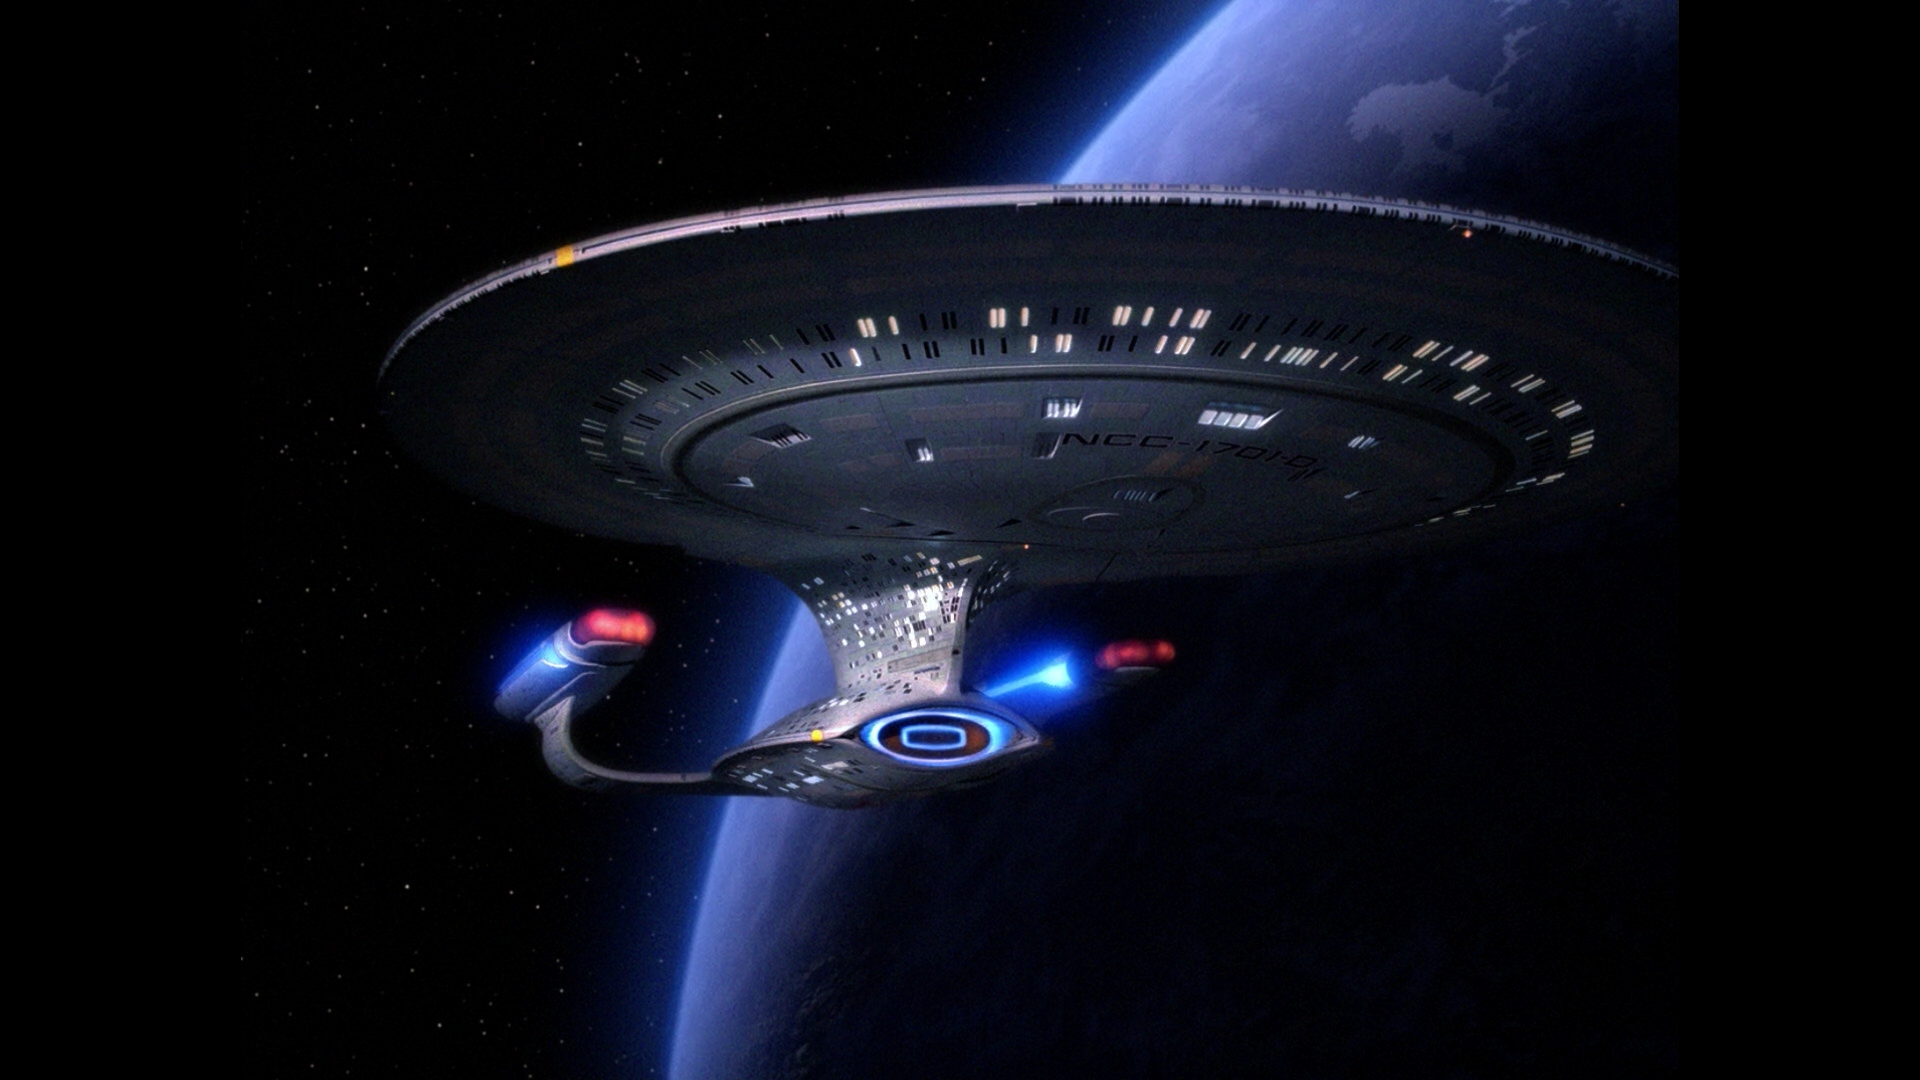 Star Trek The Next Generation Wallpaper High Resolution 1920x1080